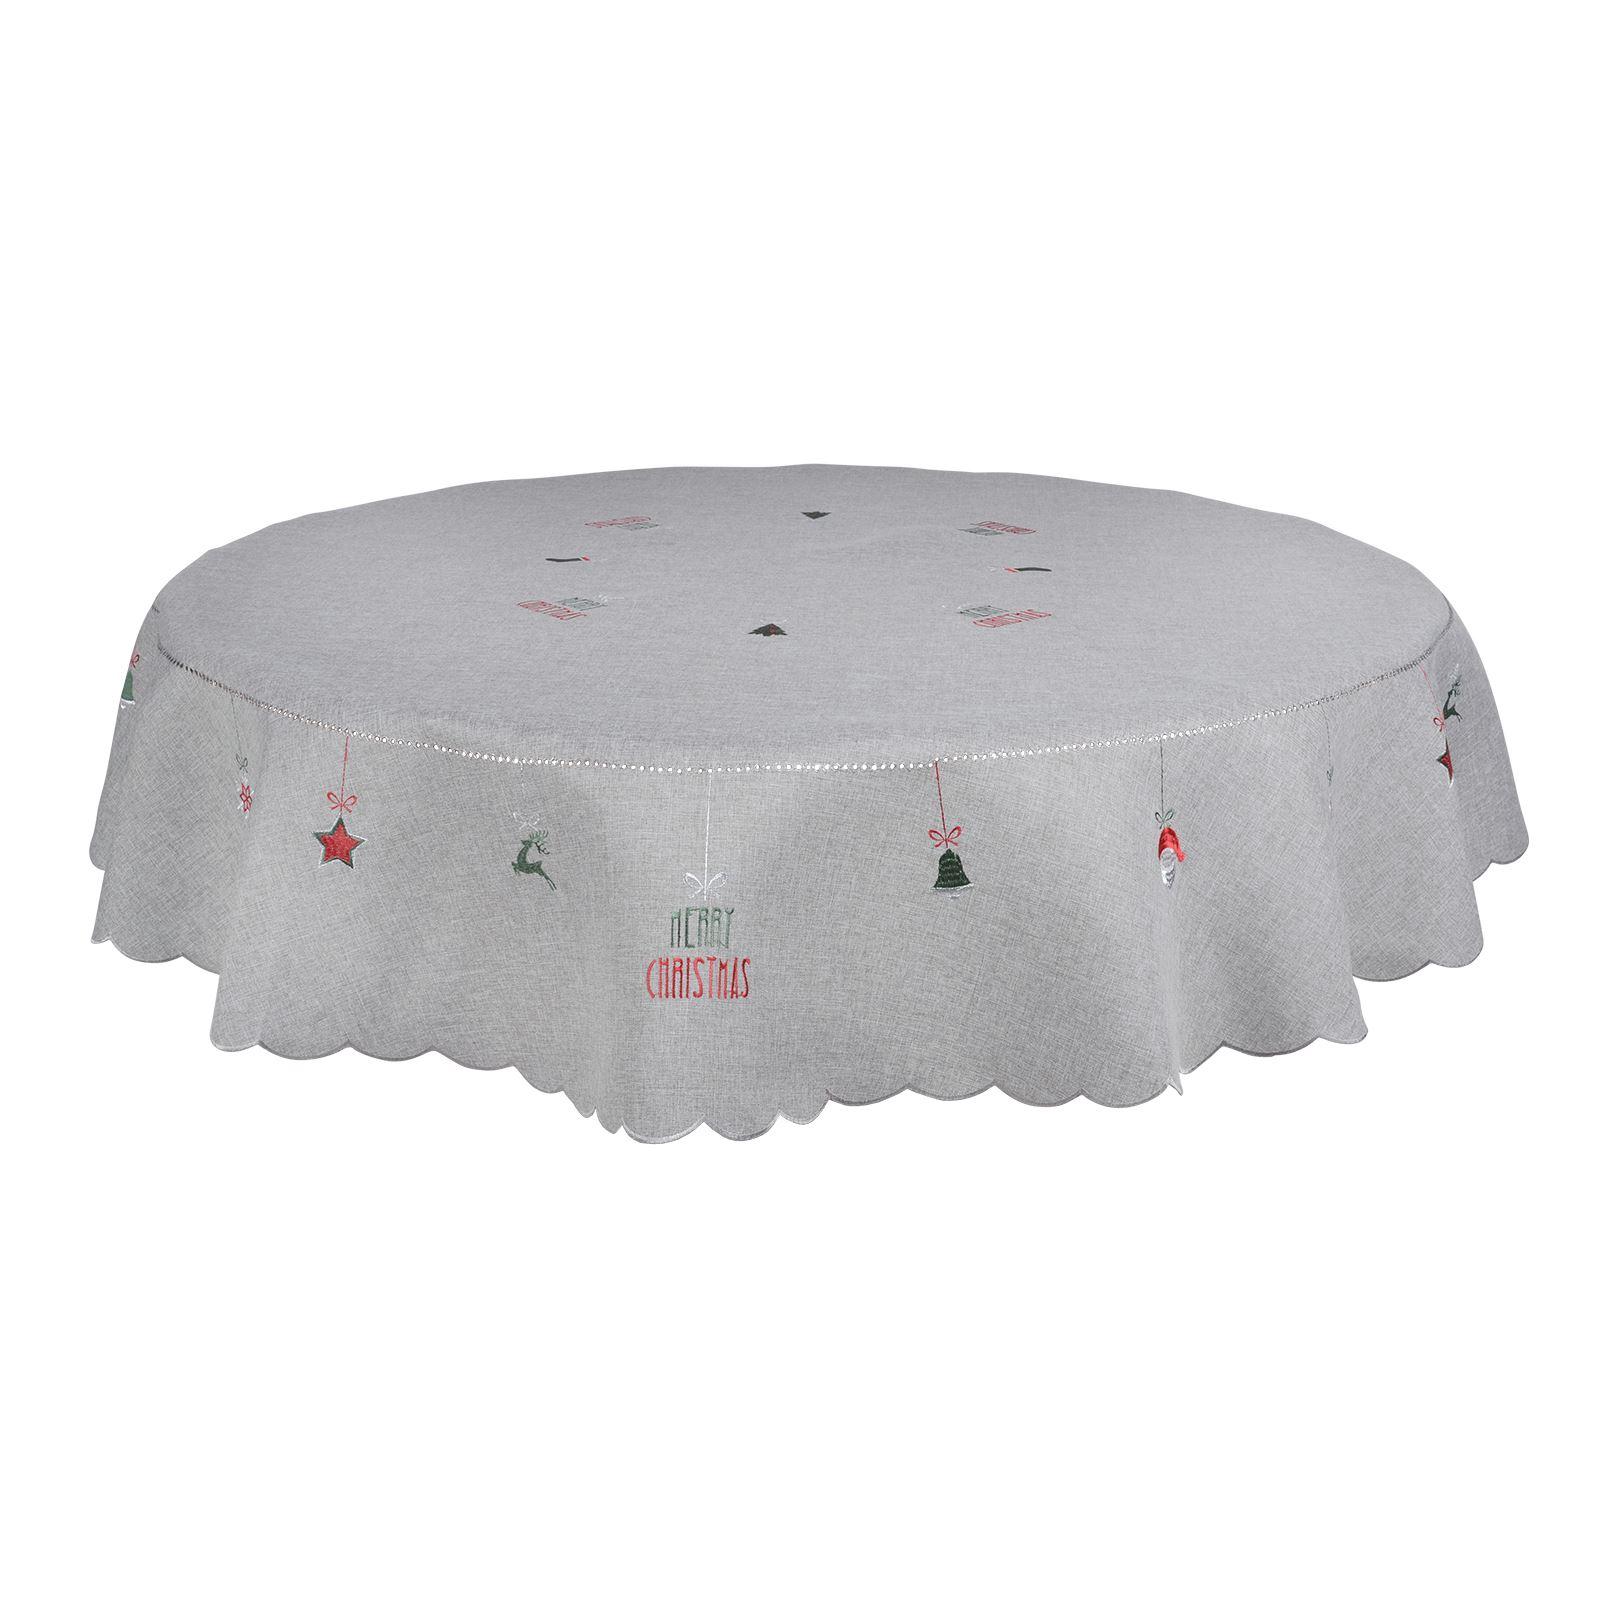 Christmas-Tablecloth-Festive-Pattern-Rectangle-Round-Fabric-Xmas-Room-Decoration Indexbild 113